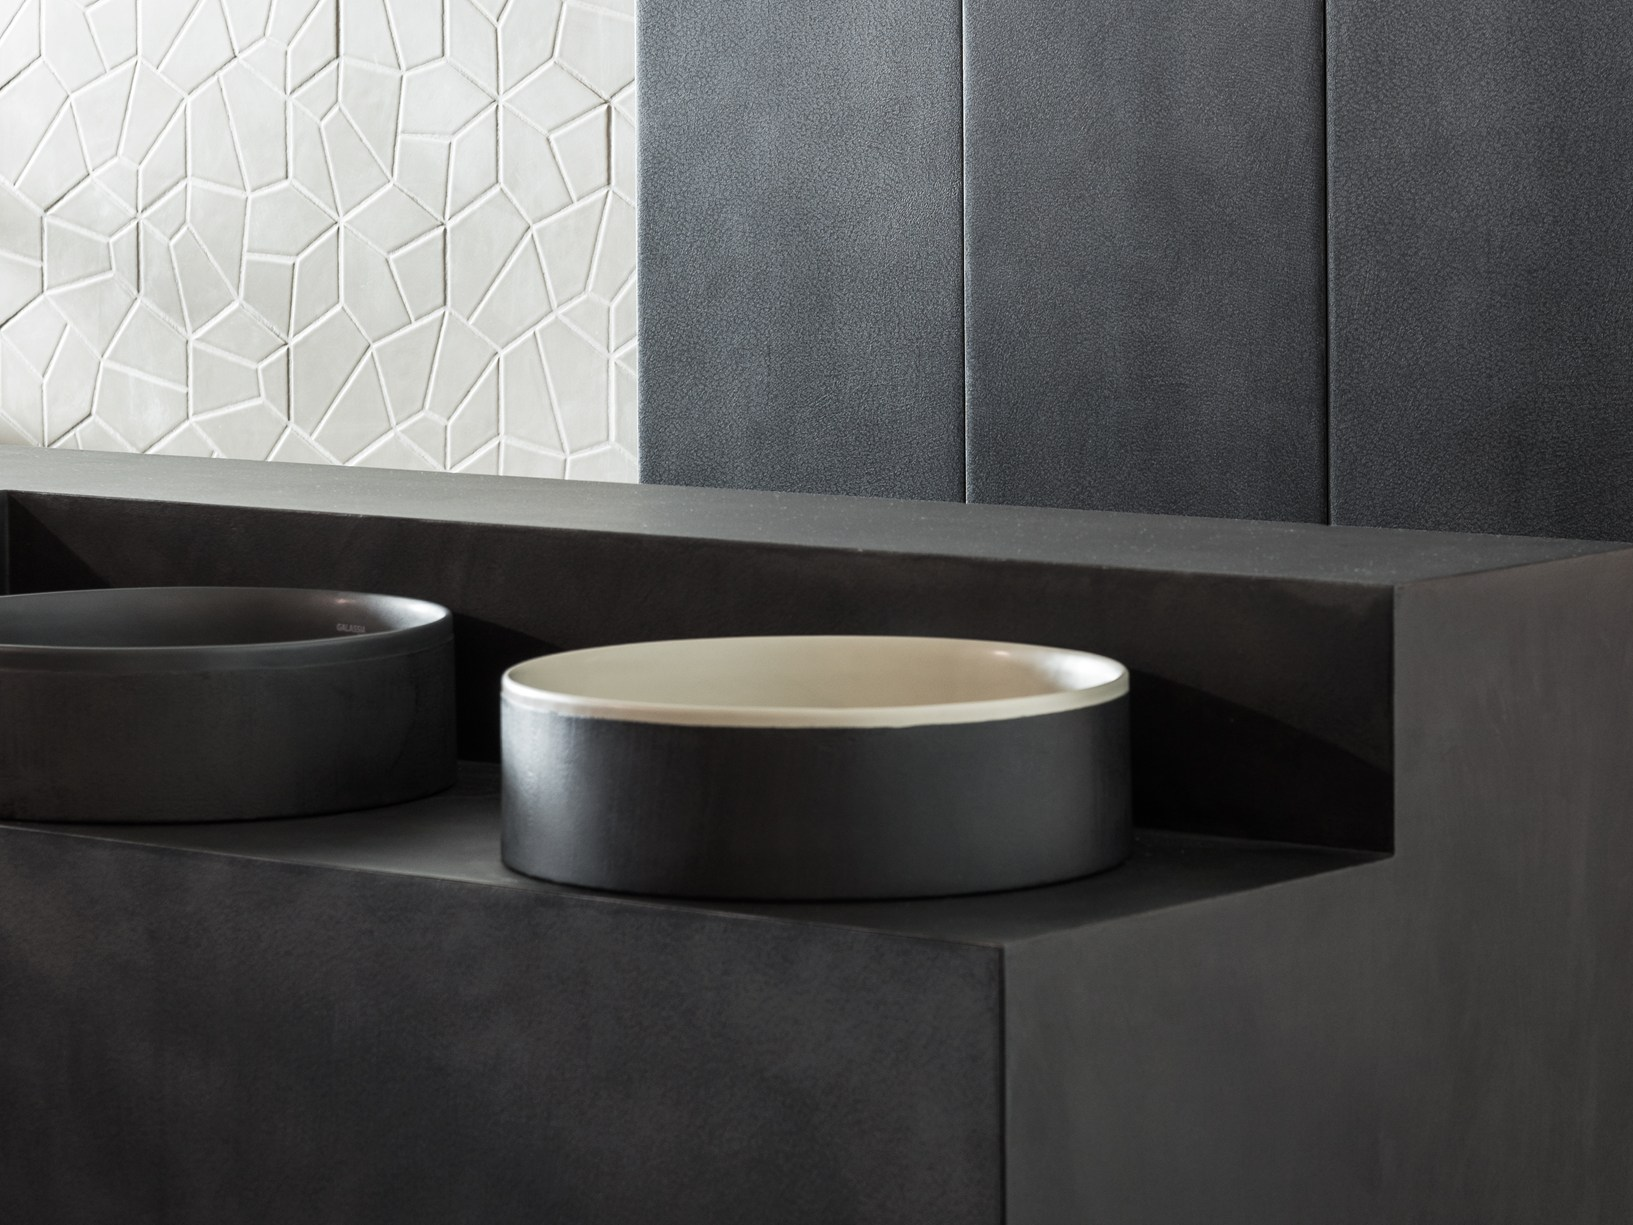 arredi, superfici e ceramica - Galassia Arredo Bagno